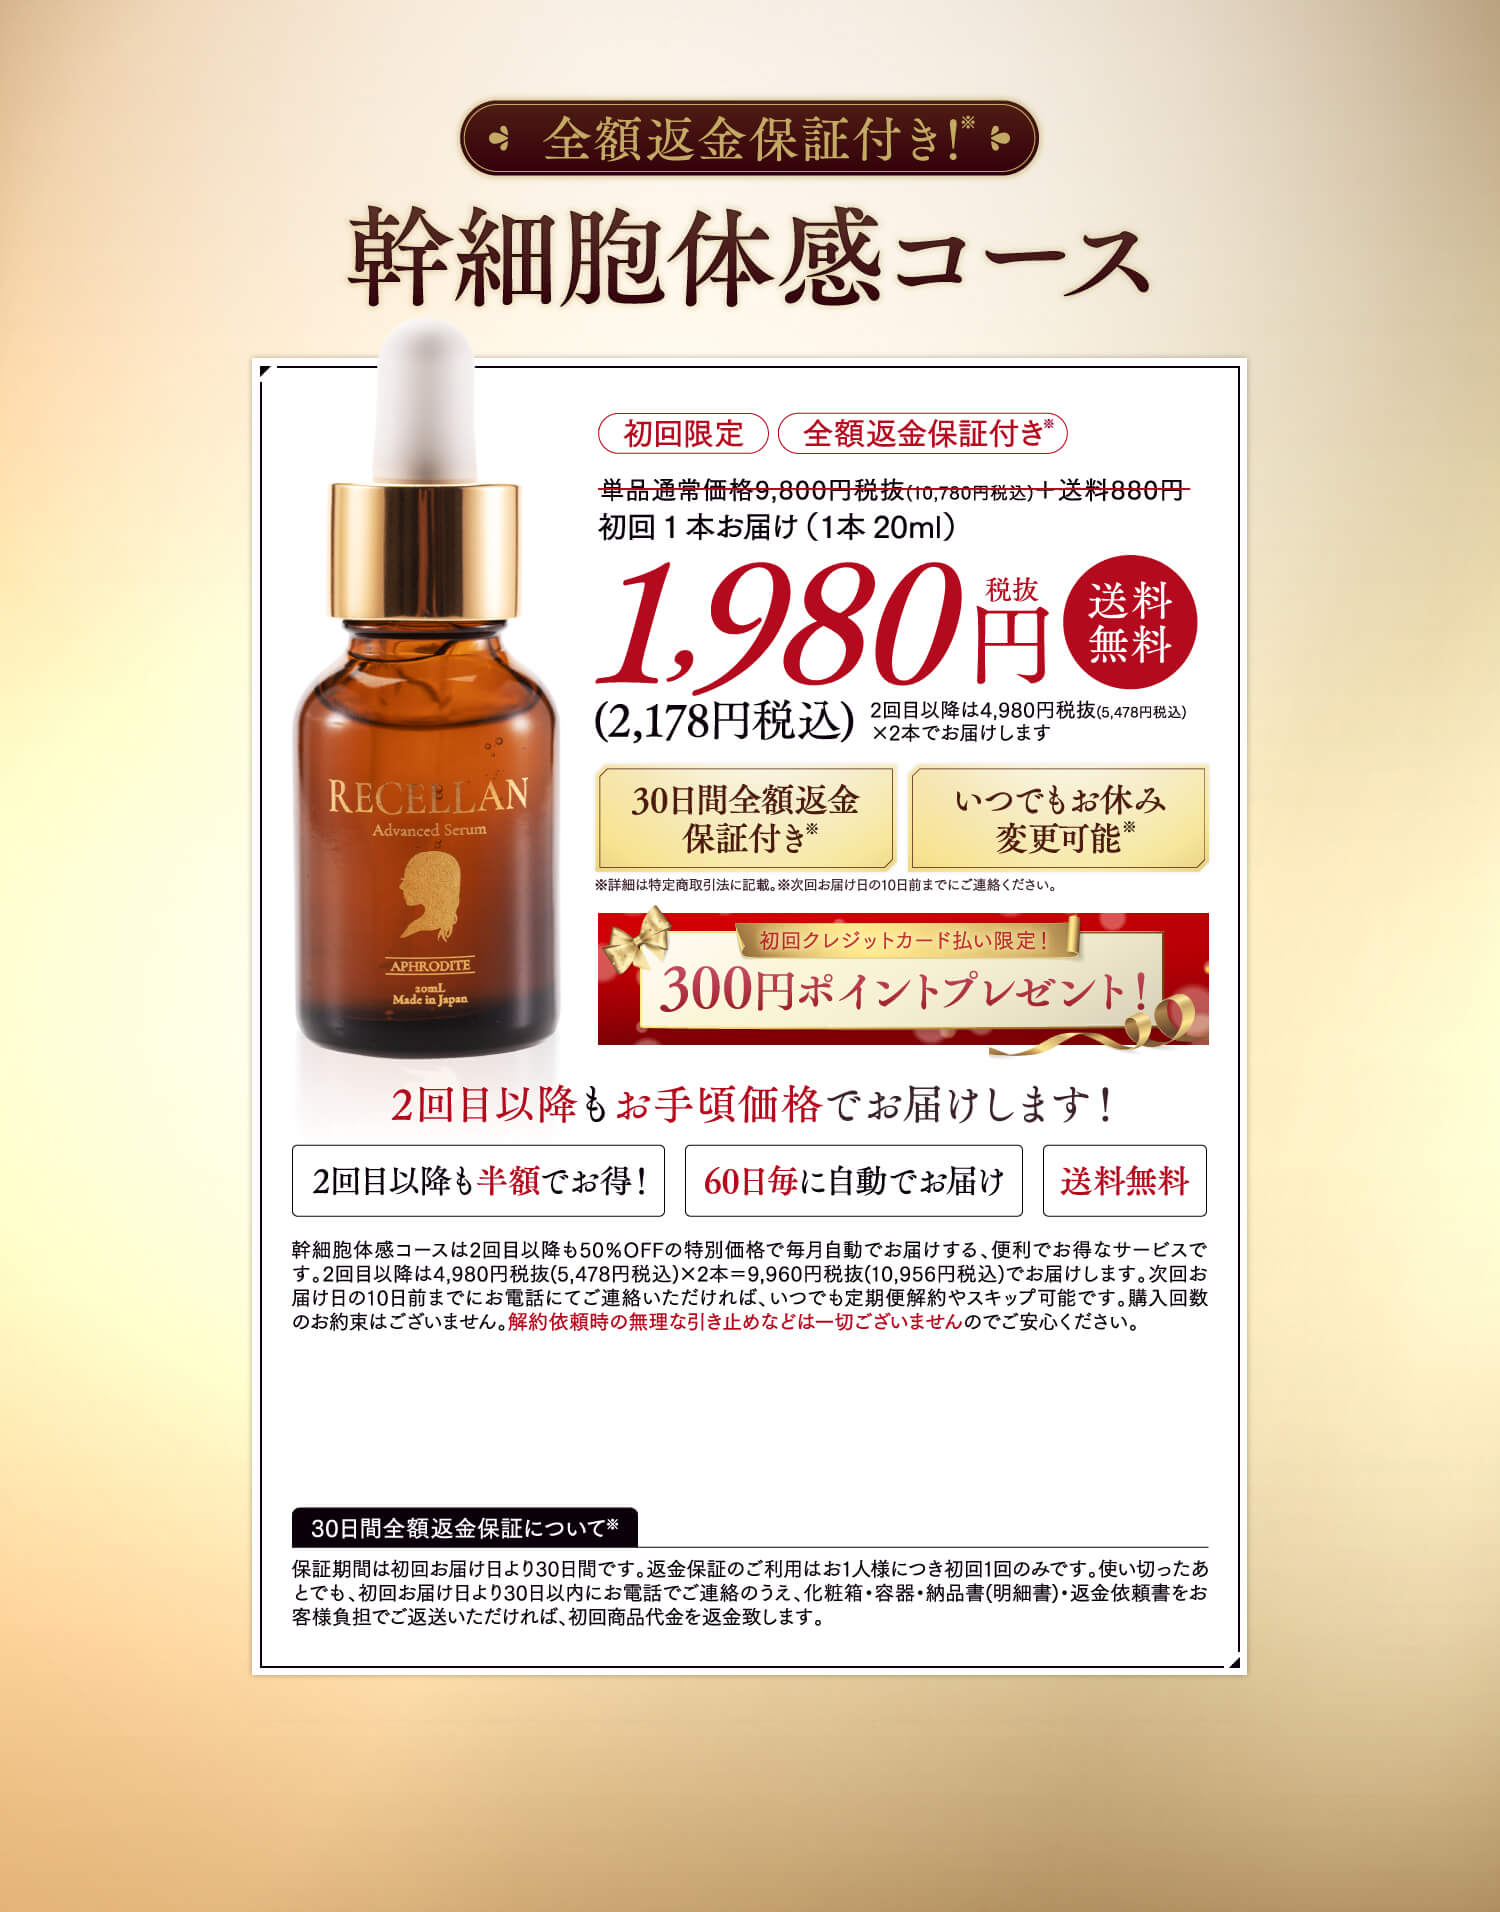 RECELLAN 幹細胞体感コース 初回1本お届け 1,980円(税抜) 送料無料